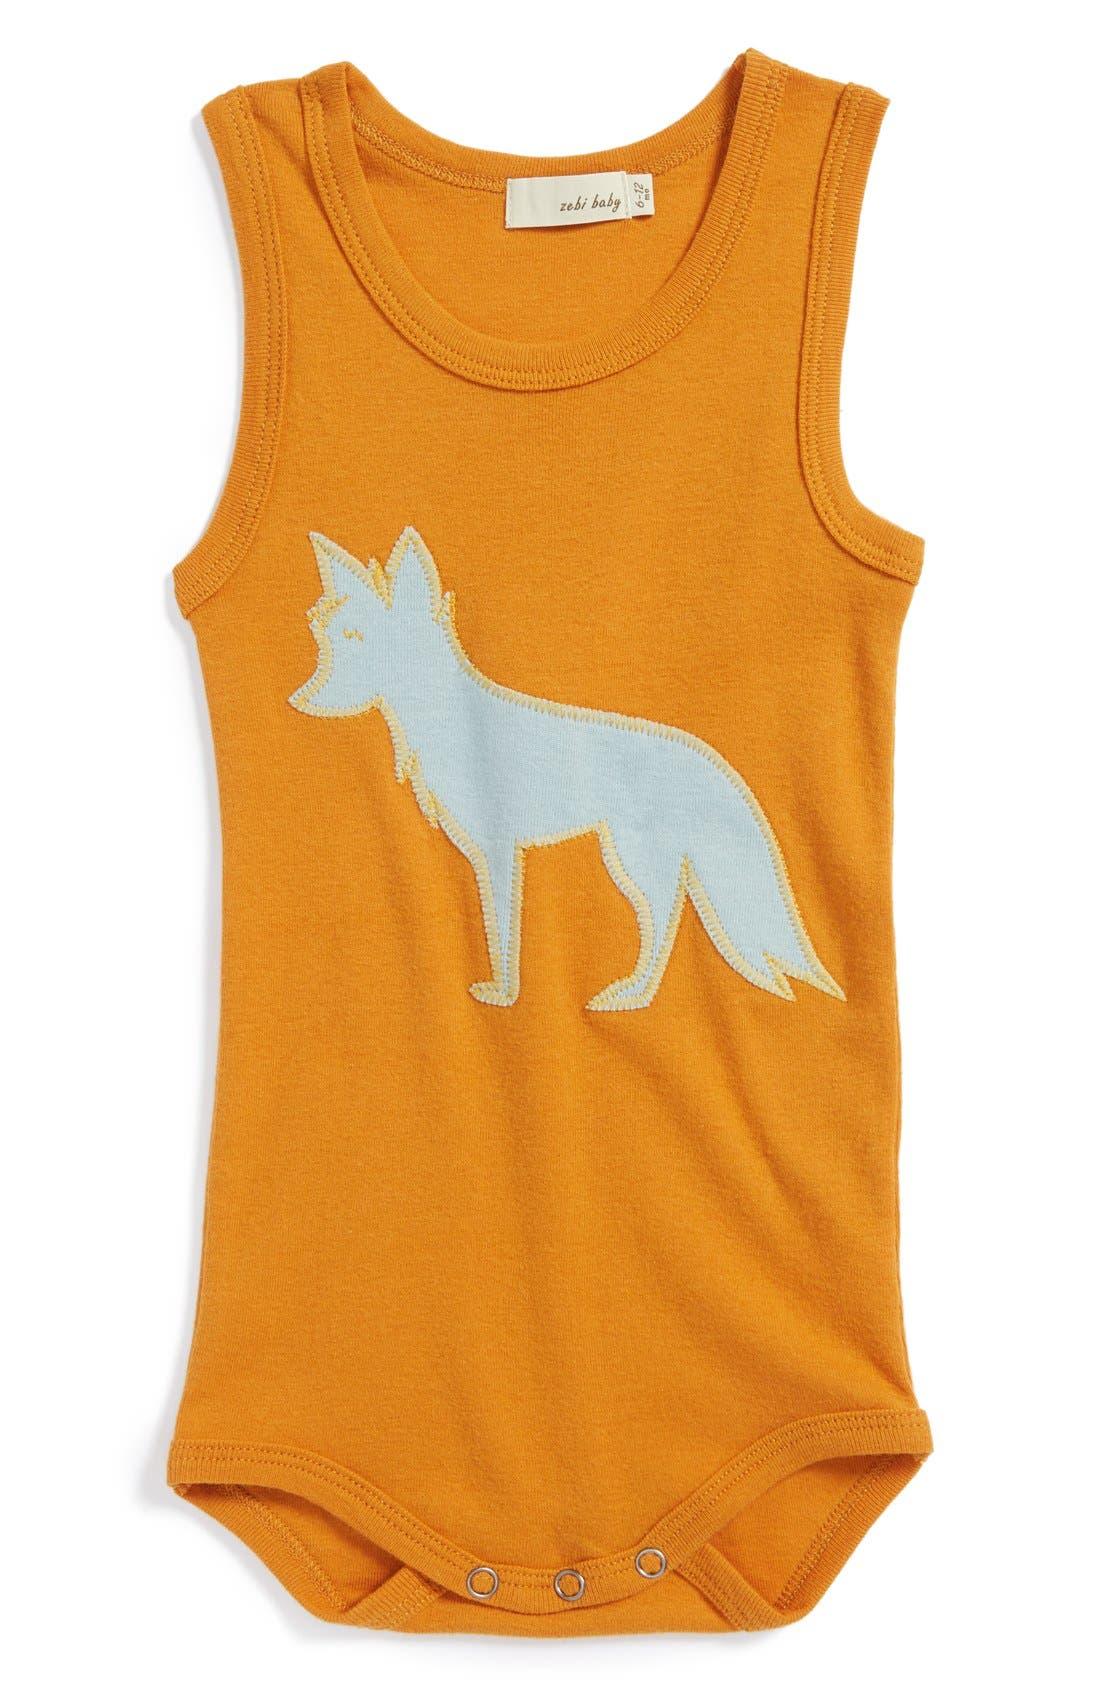 Main Image - Zebi Baby 'Fox' Organic Cotton Bodysuit (Baby Boys)